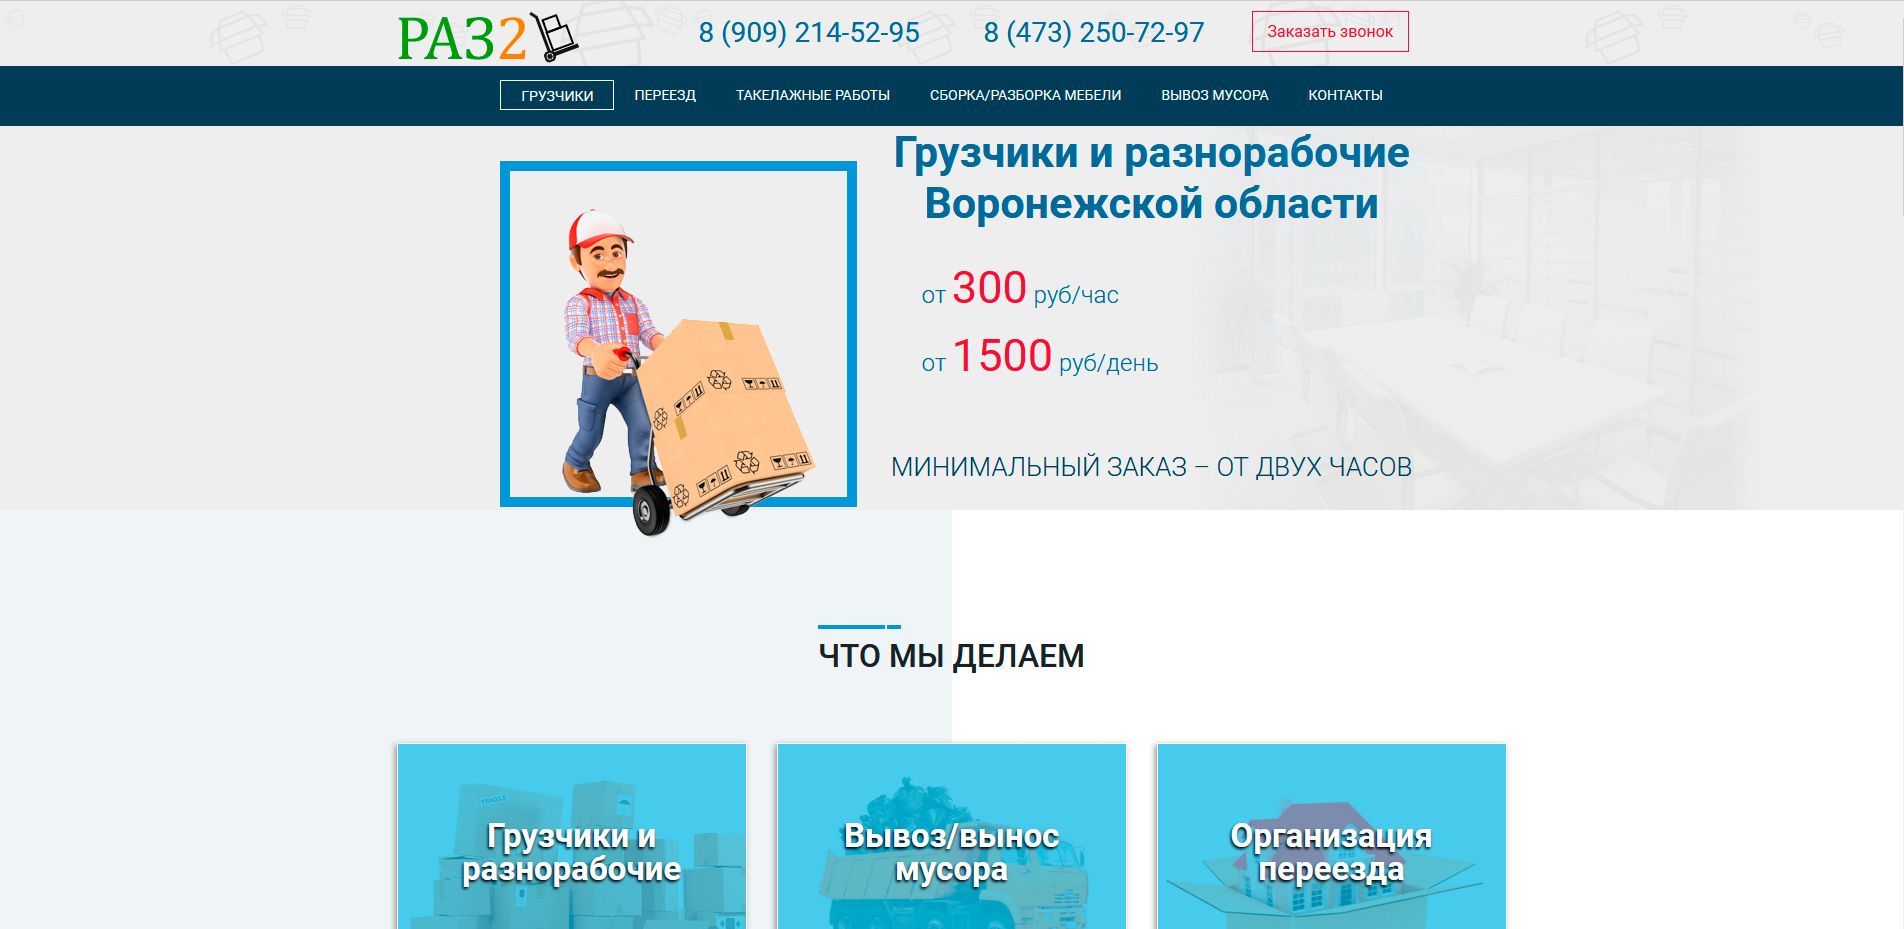 Грузчики, такелажные работы - gruzchiki-takelaj.ru